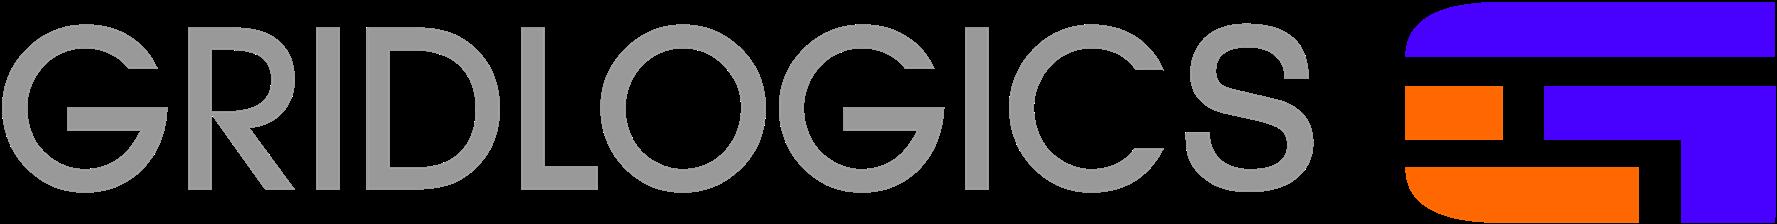 Gridlogics Logo